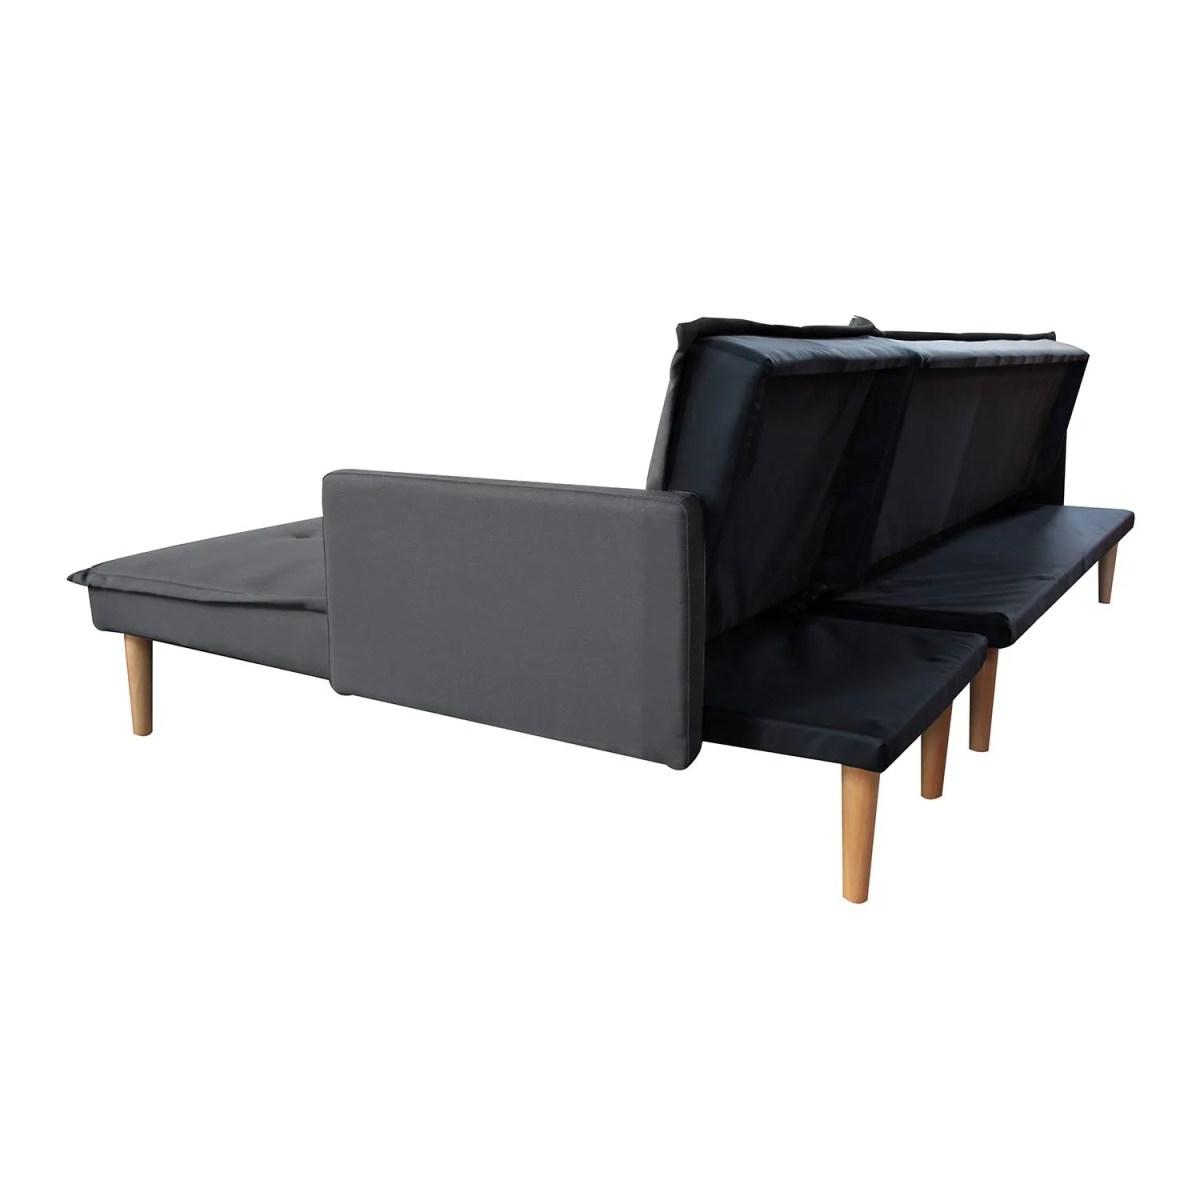 sala esquinada sofá cama independencia gris 8